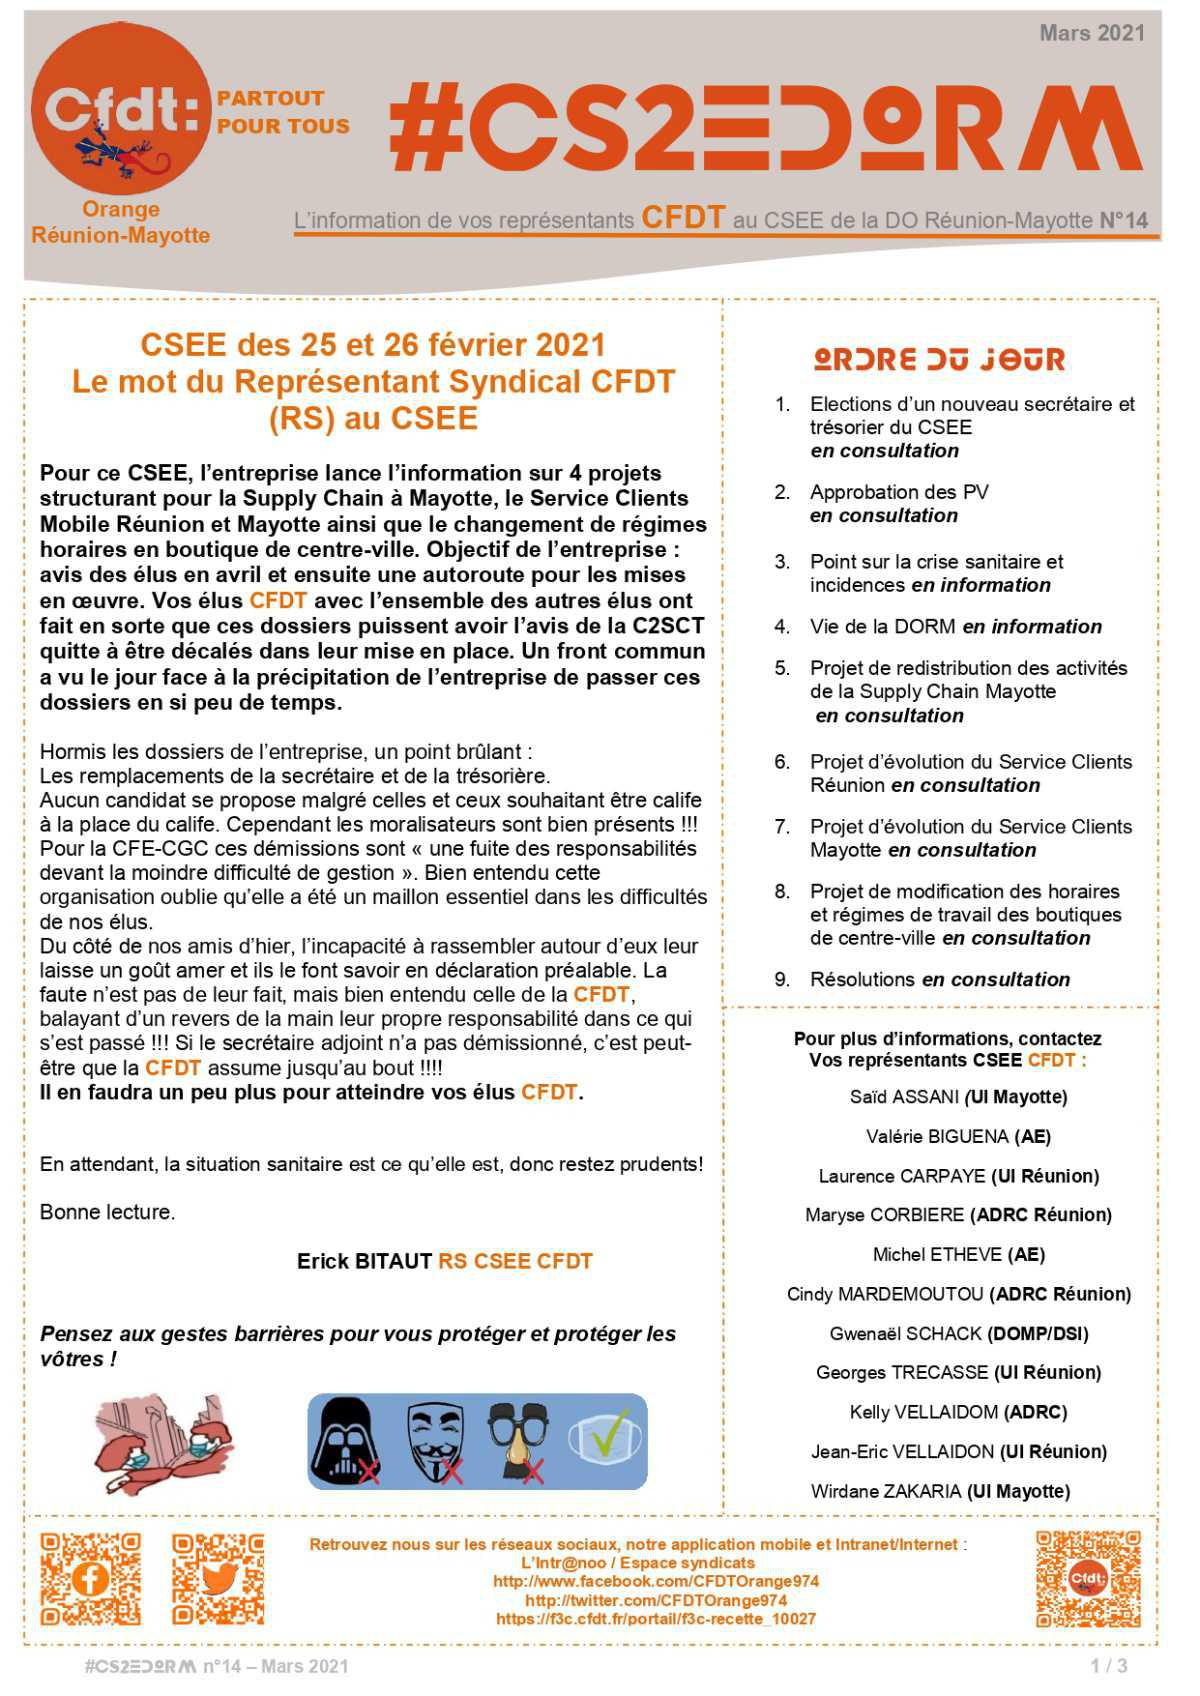 #CS2EDORM n°14 - CSEE des 25 et 26 février 2021